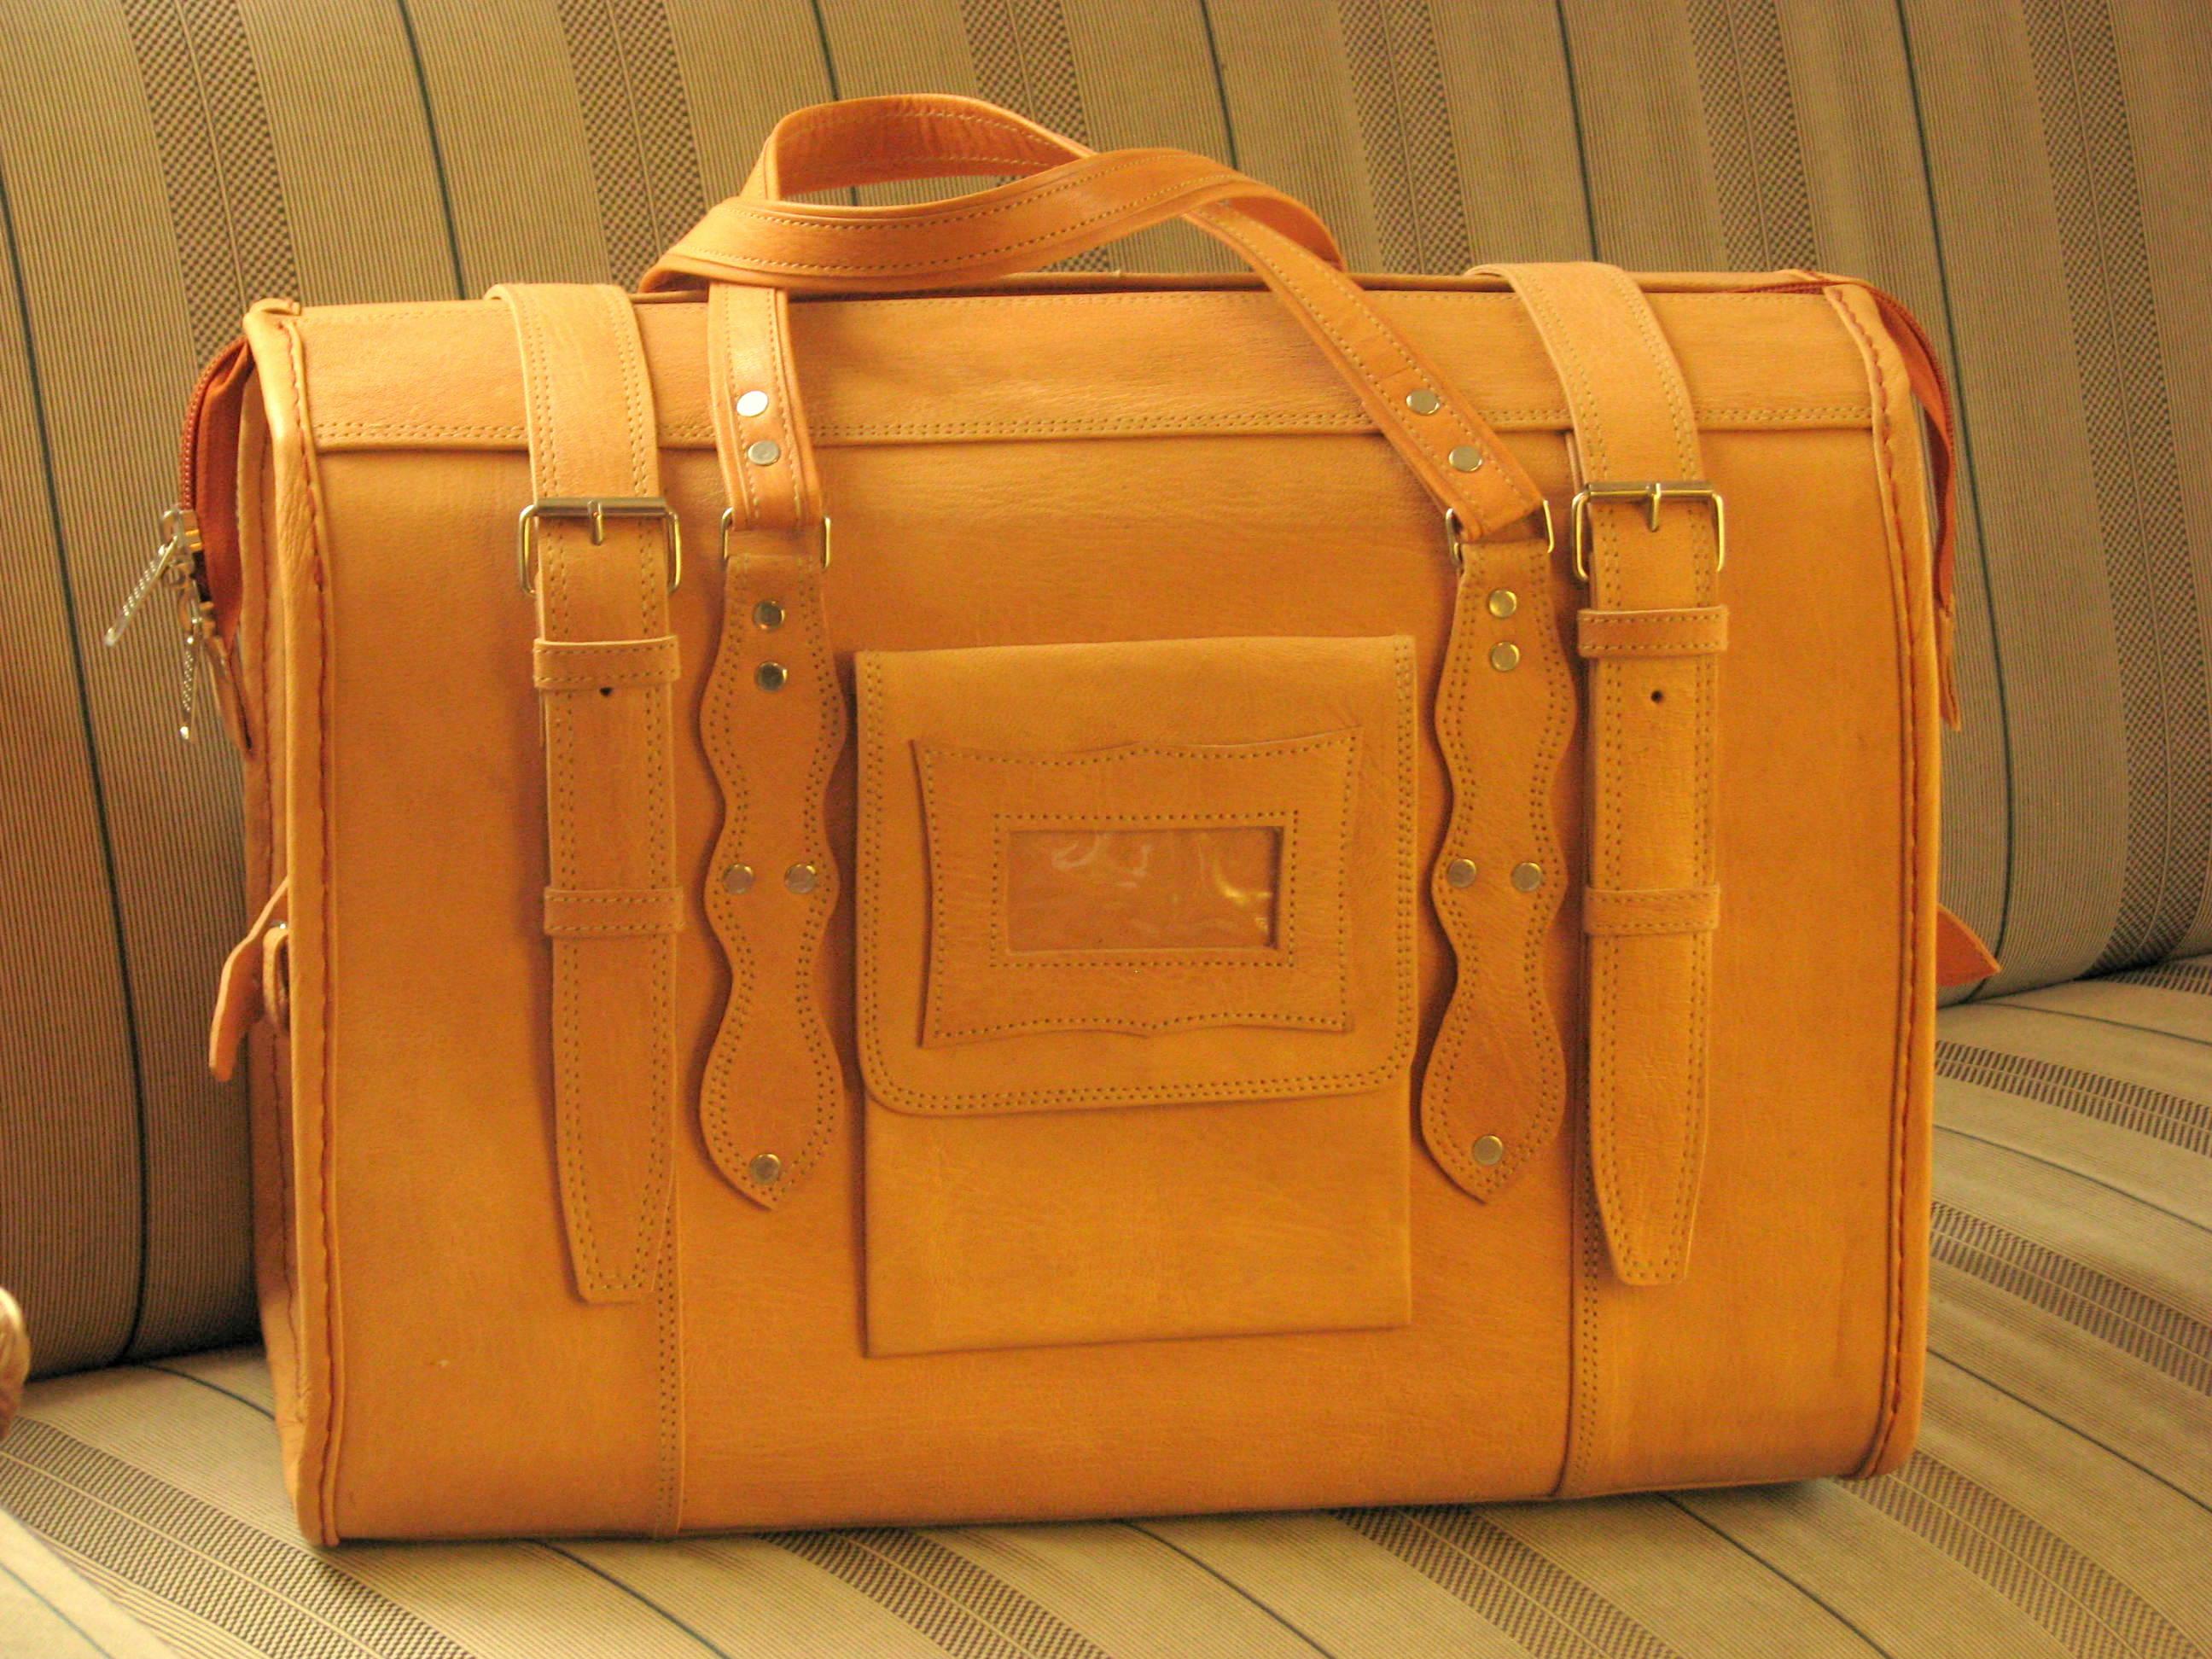 sac de voyage en cuir bagage cabine equitable marco. Black Bedroom Furniture Sets. Home Design Ideas